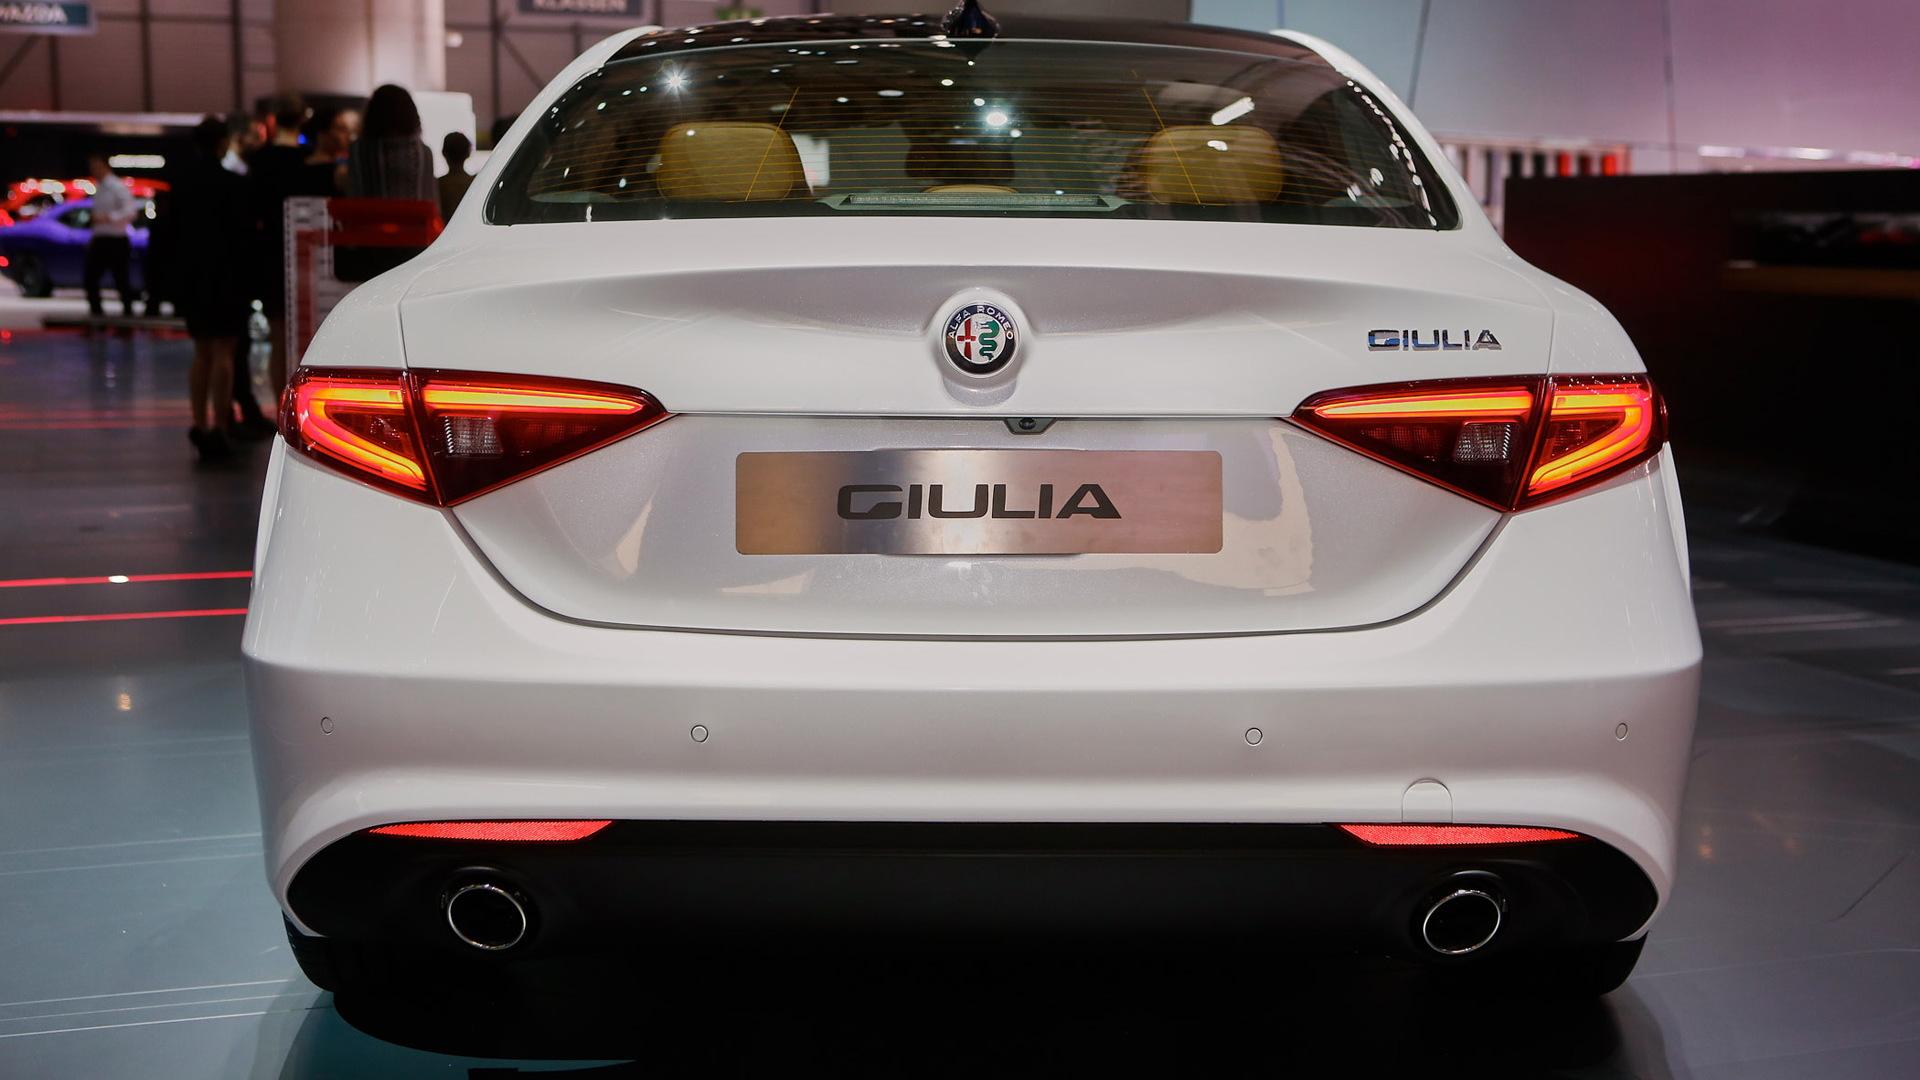 2017 Alfa Romeo Giulia's regular trim levels revealed in